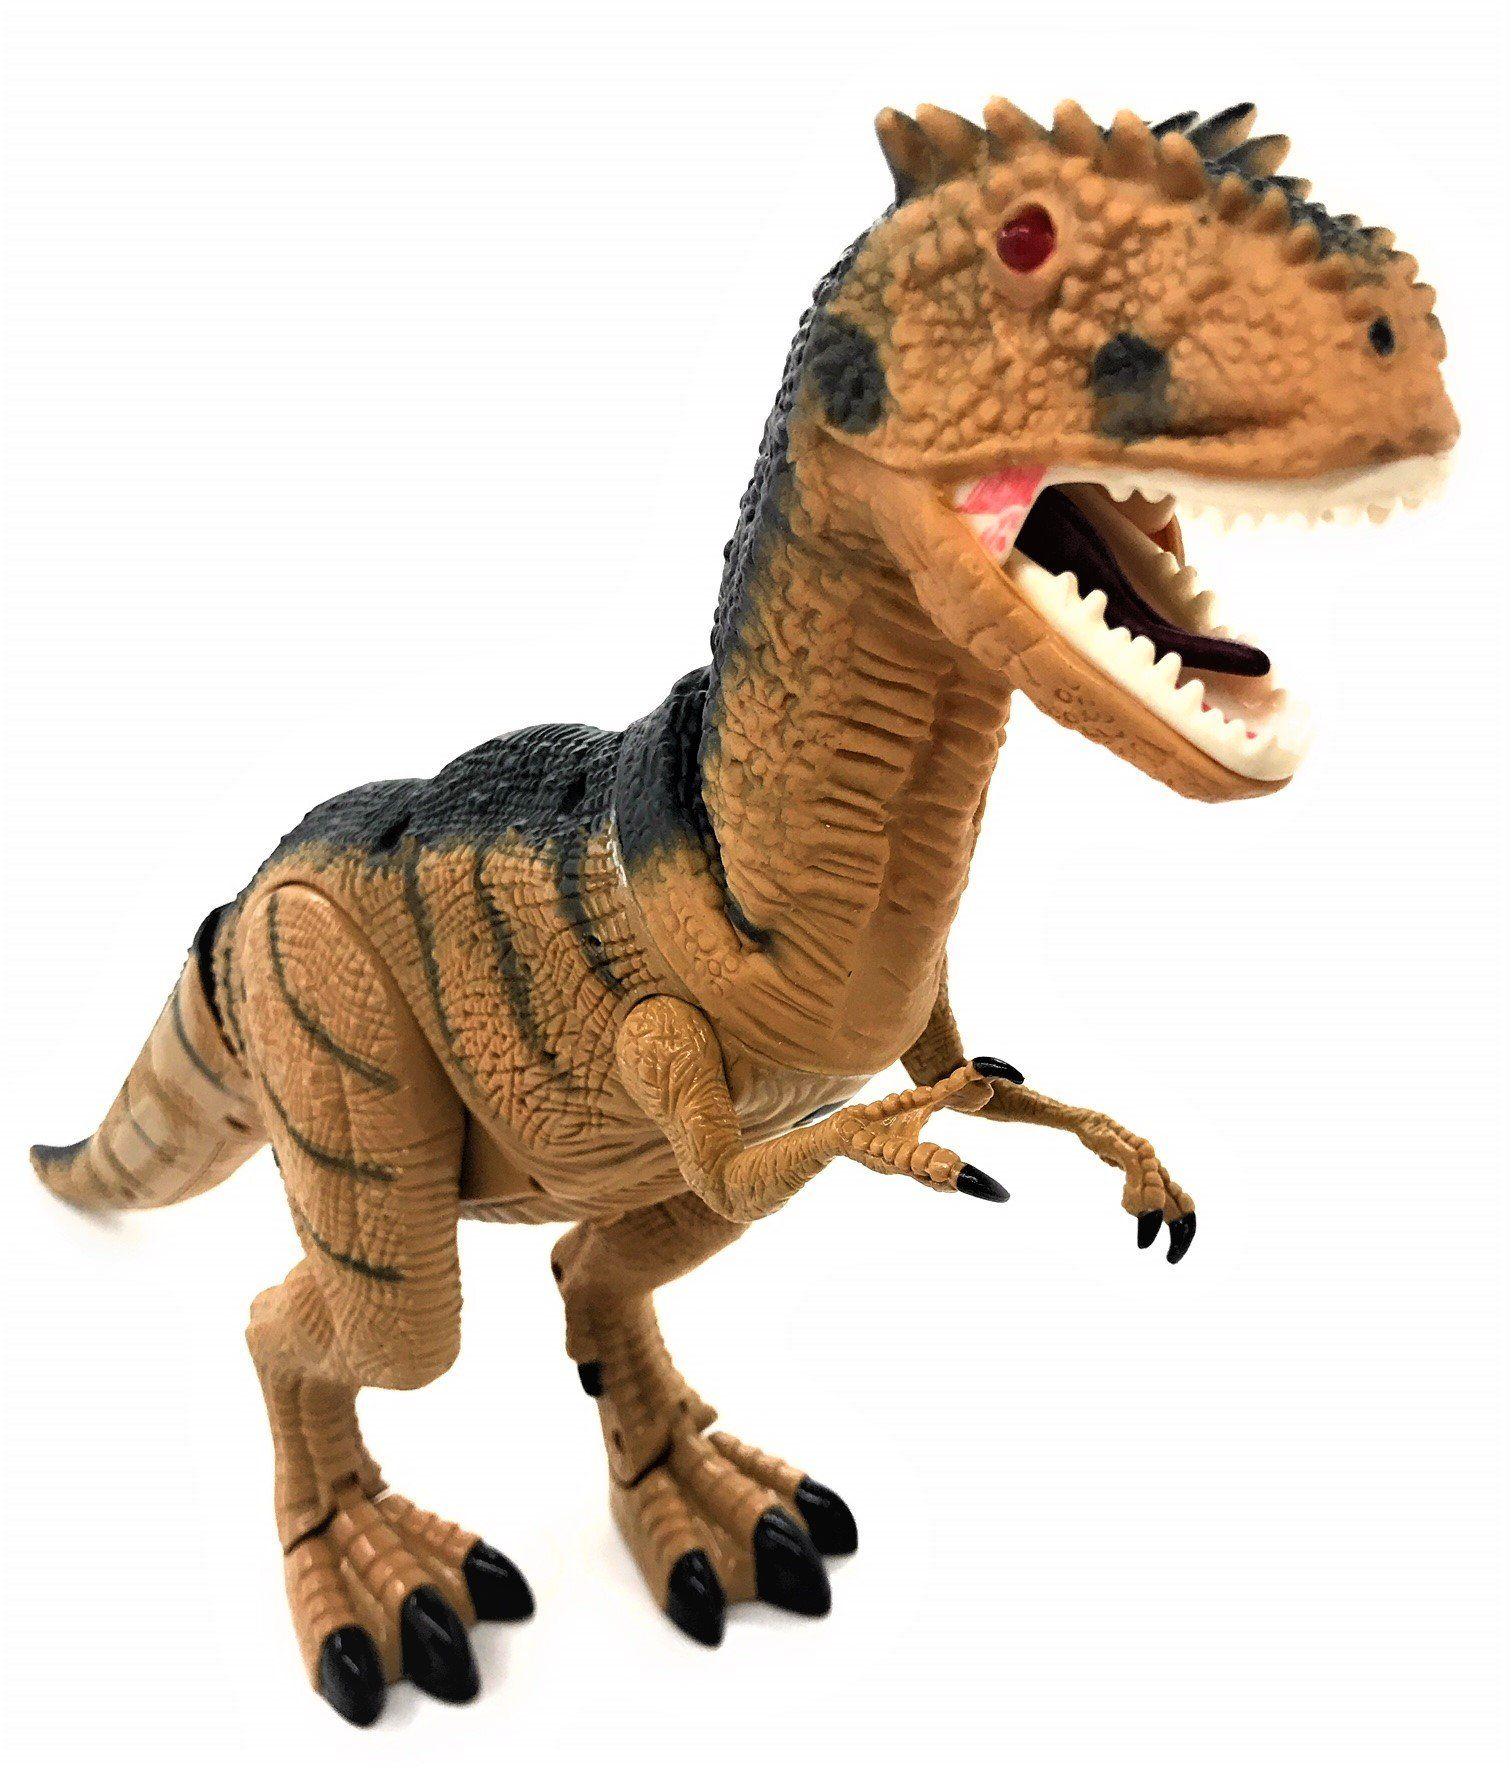 O B Toysandgift Dinosaur Walking Toy Remote Control Tyrannosaurus Rex Rc T Rex Head Shakes Lights And Sounds Christmas Tyrannosaurus Rex Tyrannosaurus Dinosaur